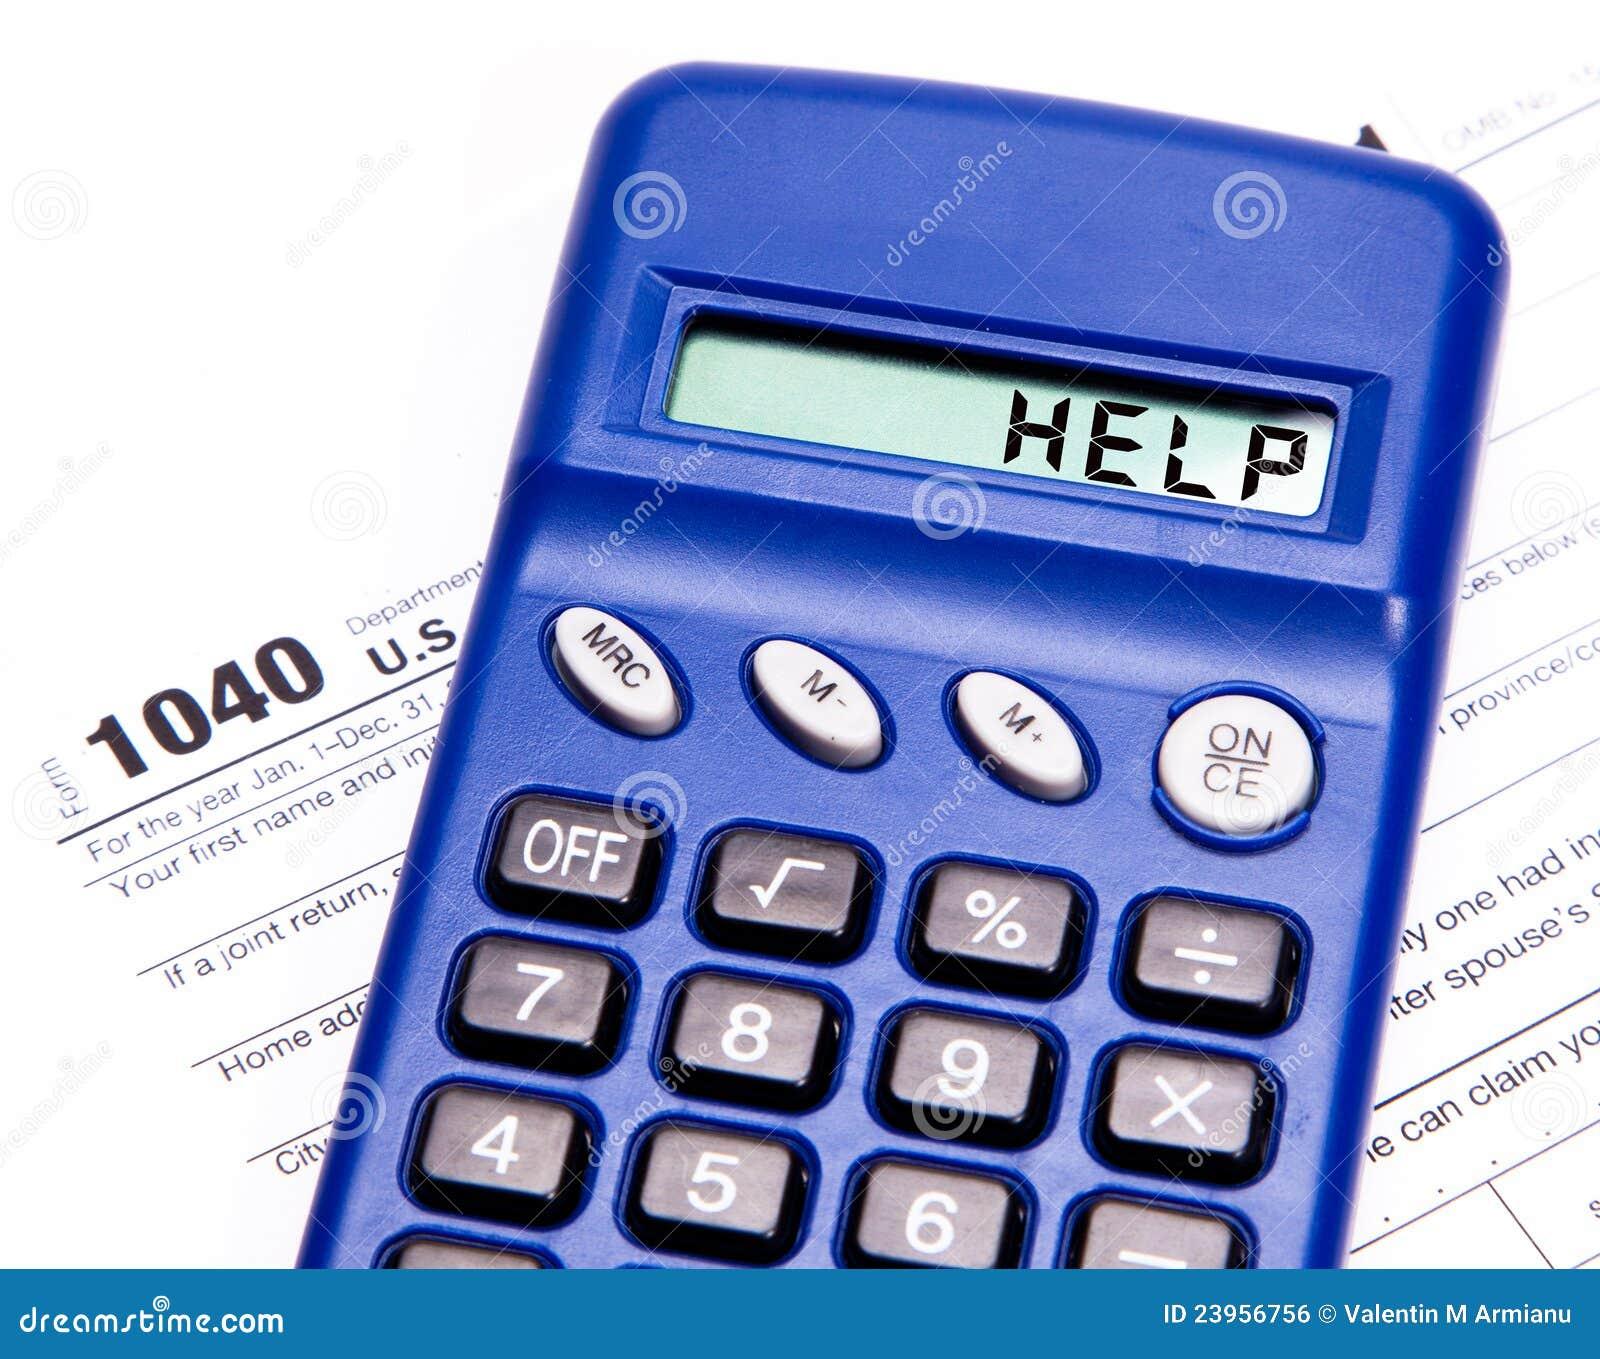 how to calculate tax homework help